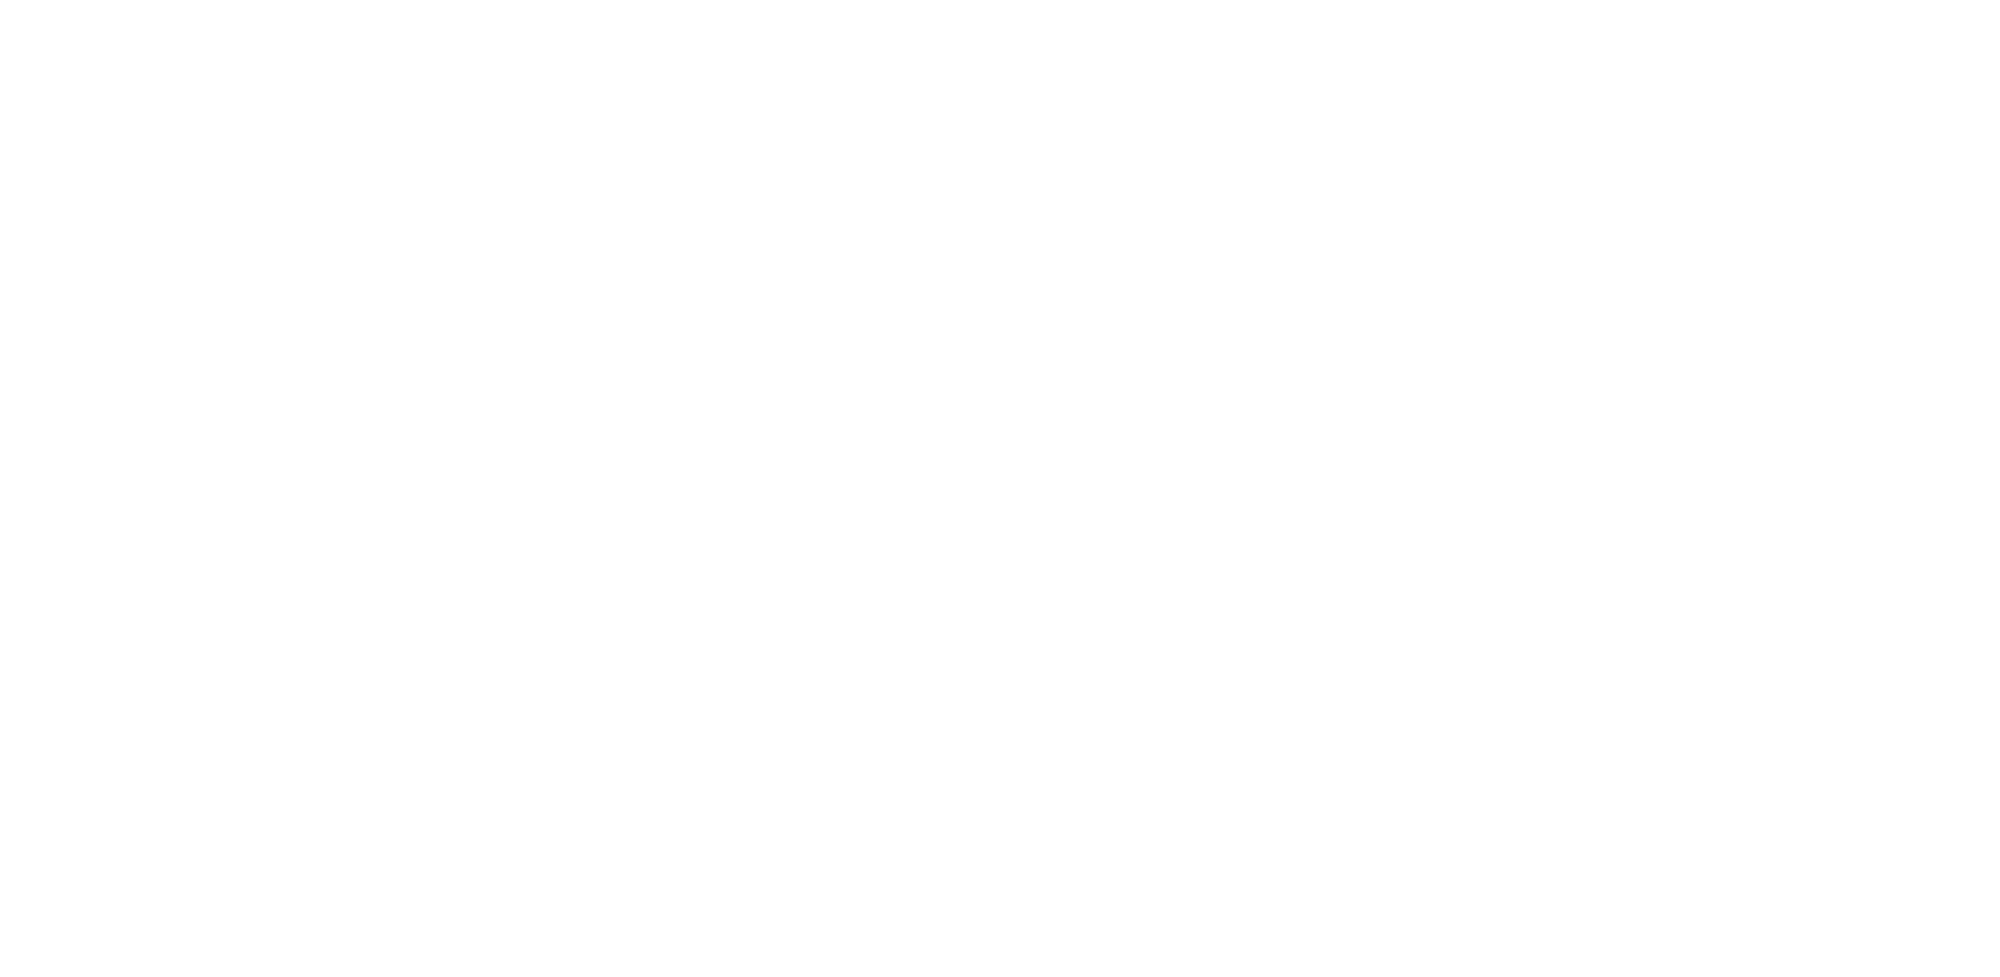 Krystie Rachelle Photography